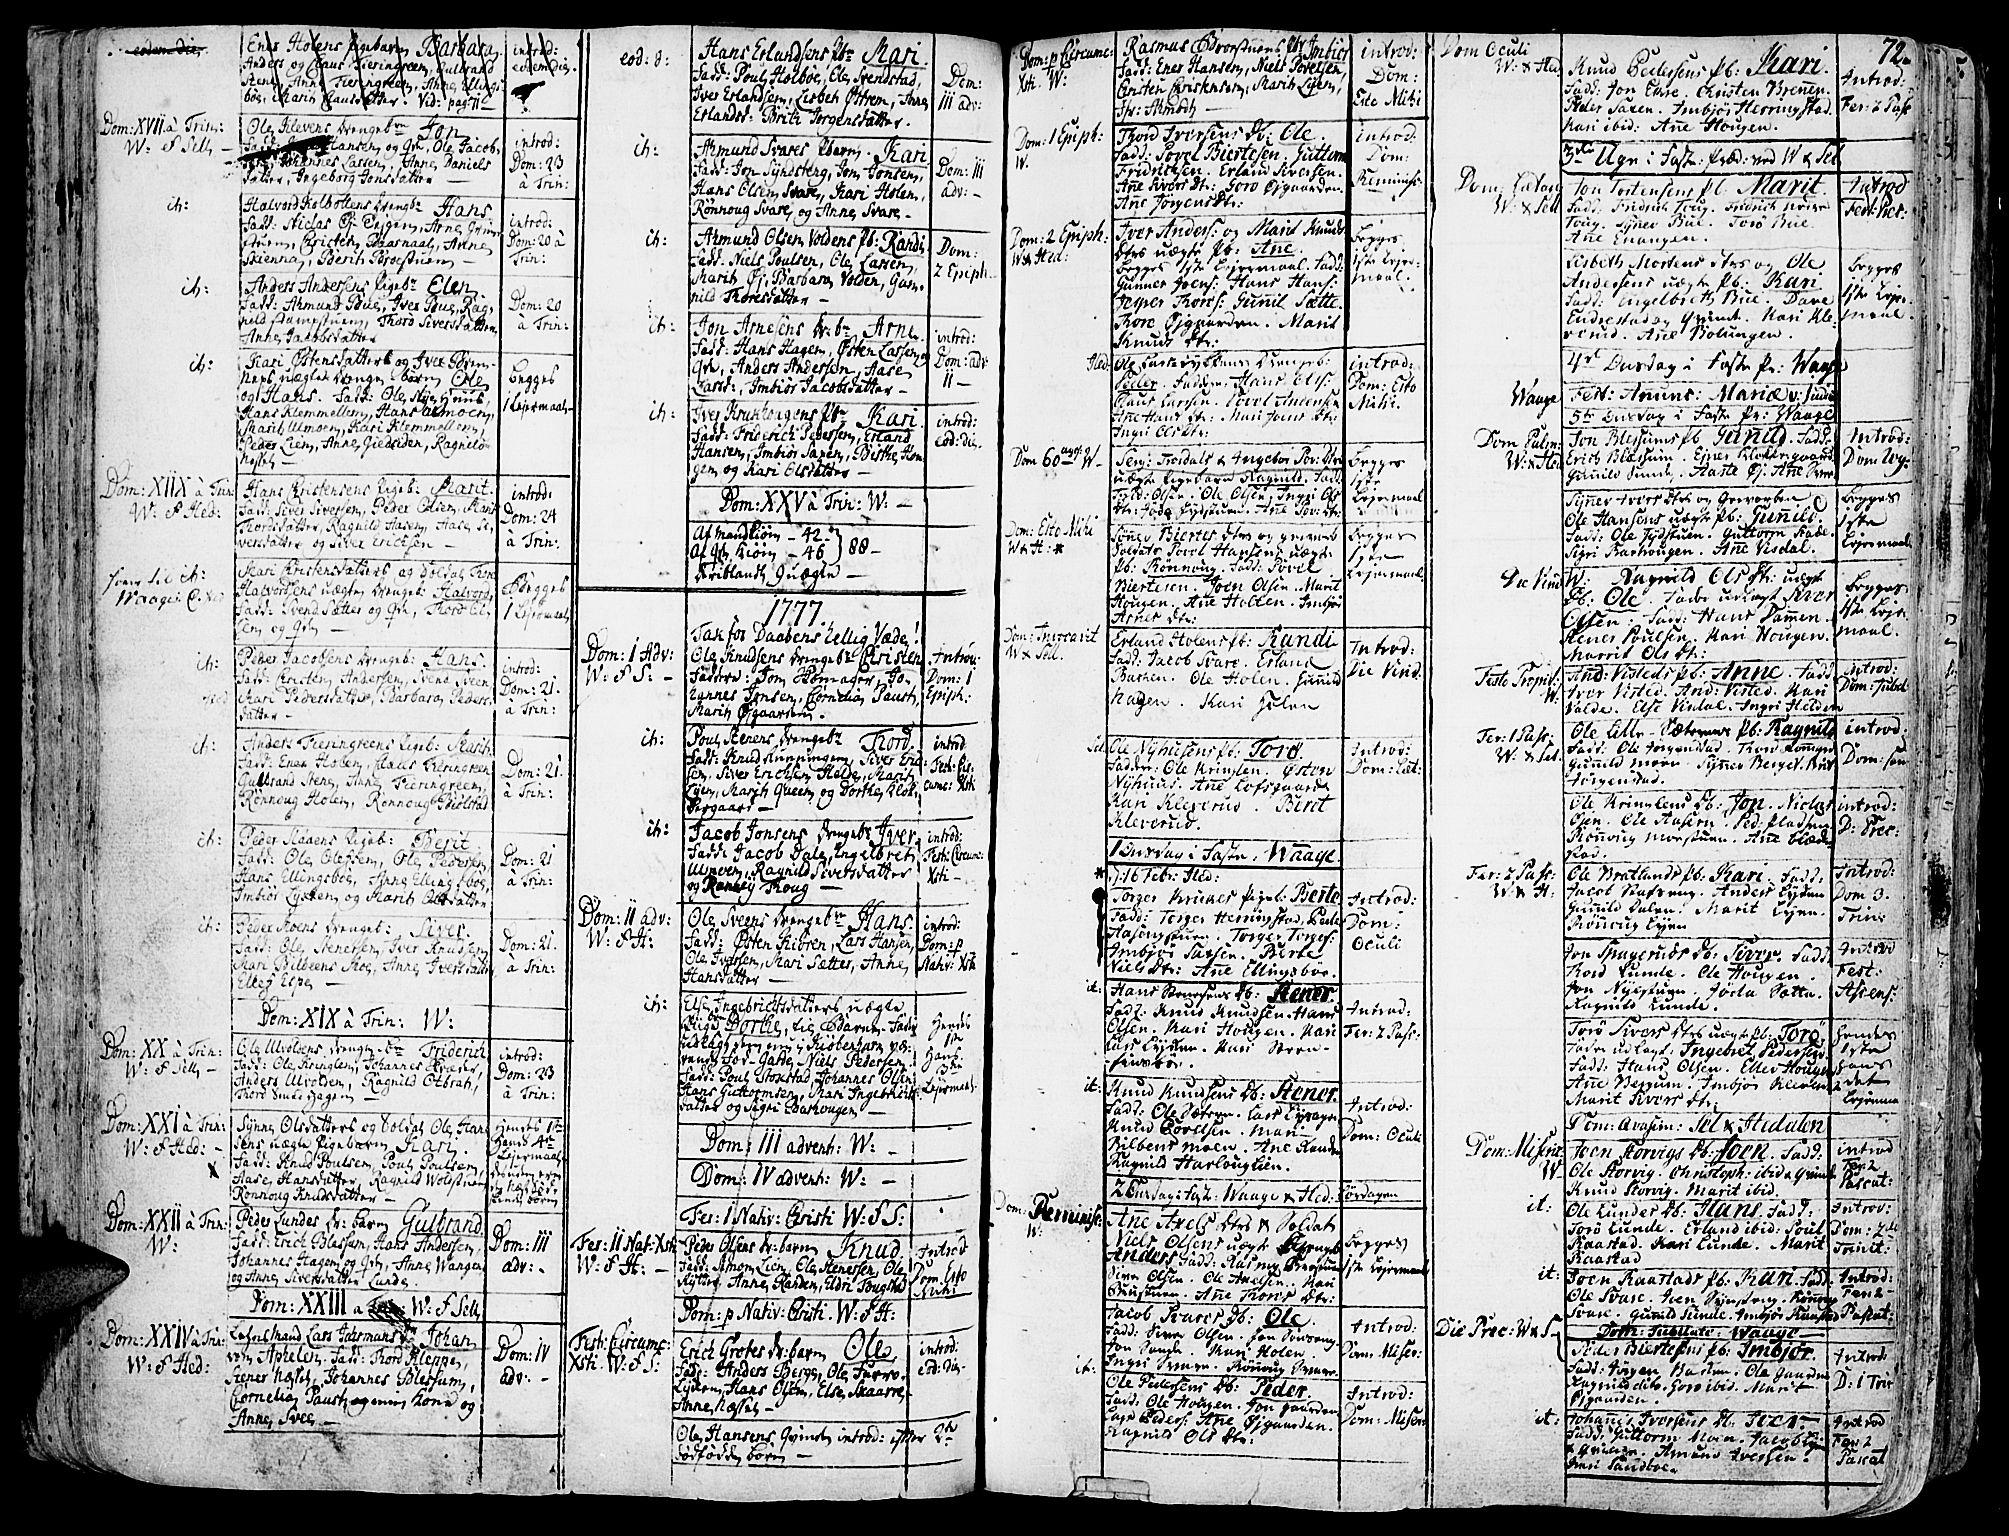 SAH, Vågå prestekontor, Ministerialbok nr. 1, 1739-1810, s. 72